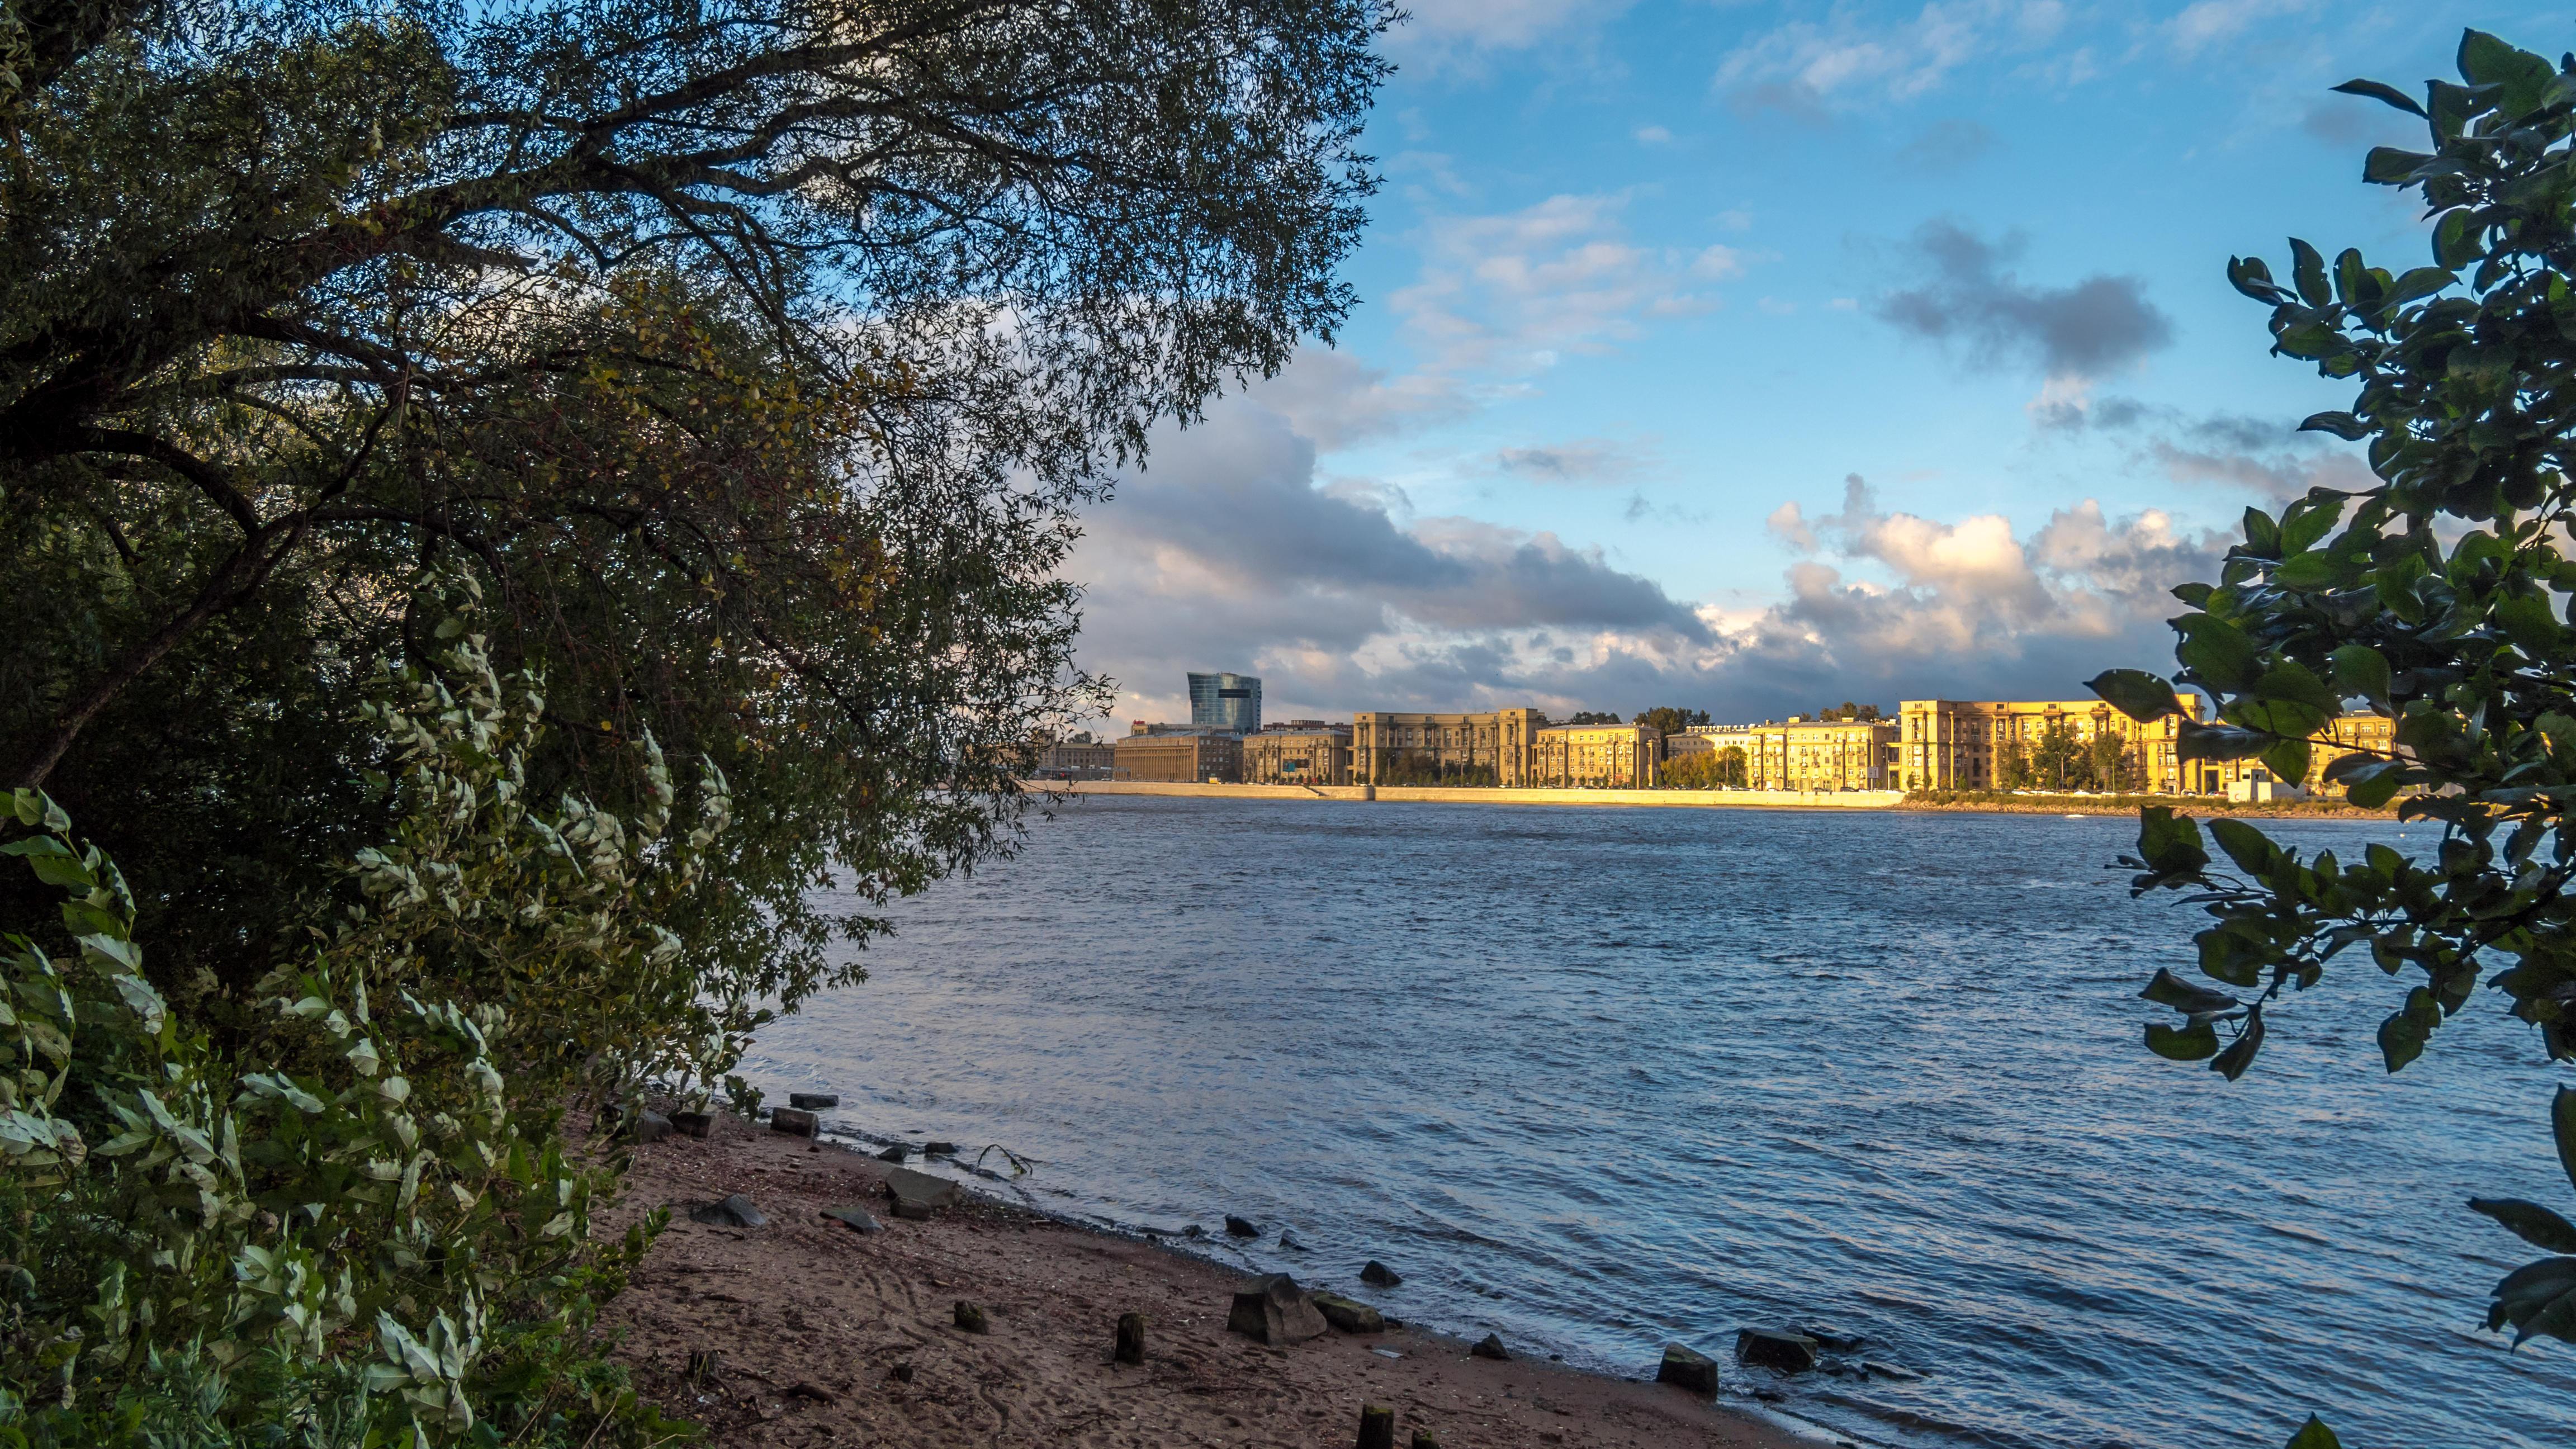 обои Neva river, St Petersburg картинки фото